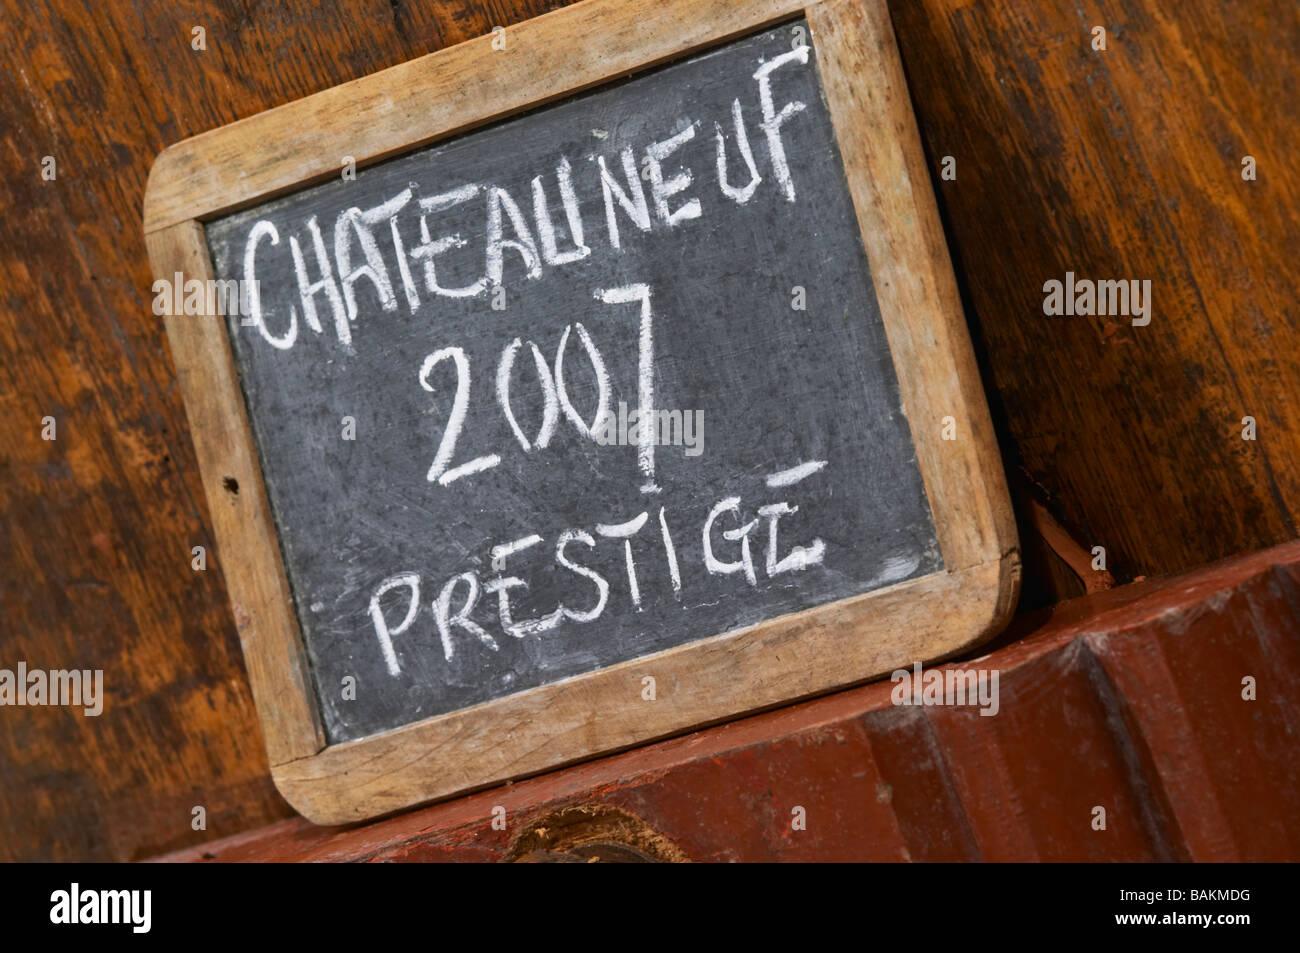 sign on tank 2007 prestige domaine roger sabon chateauneuf du pape rhone france - Stock Image